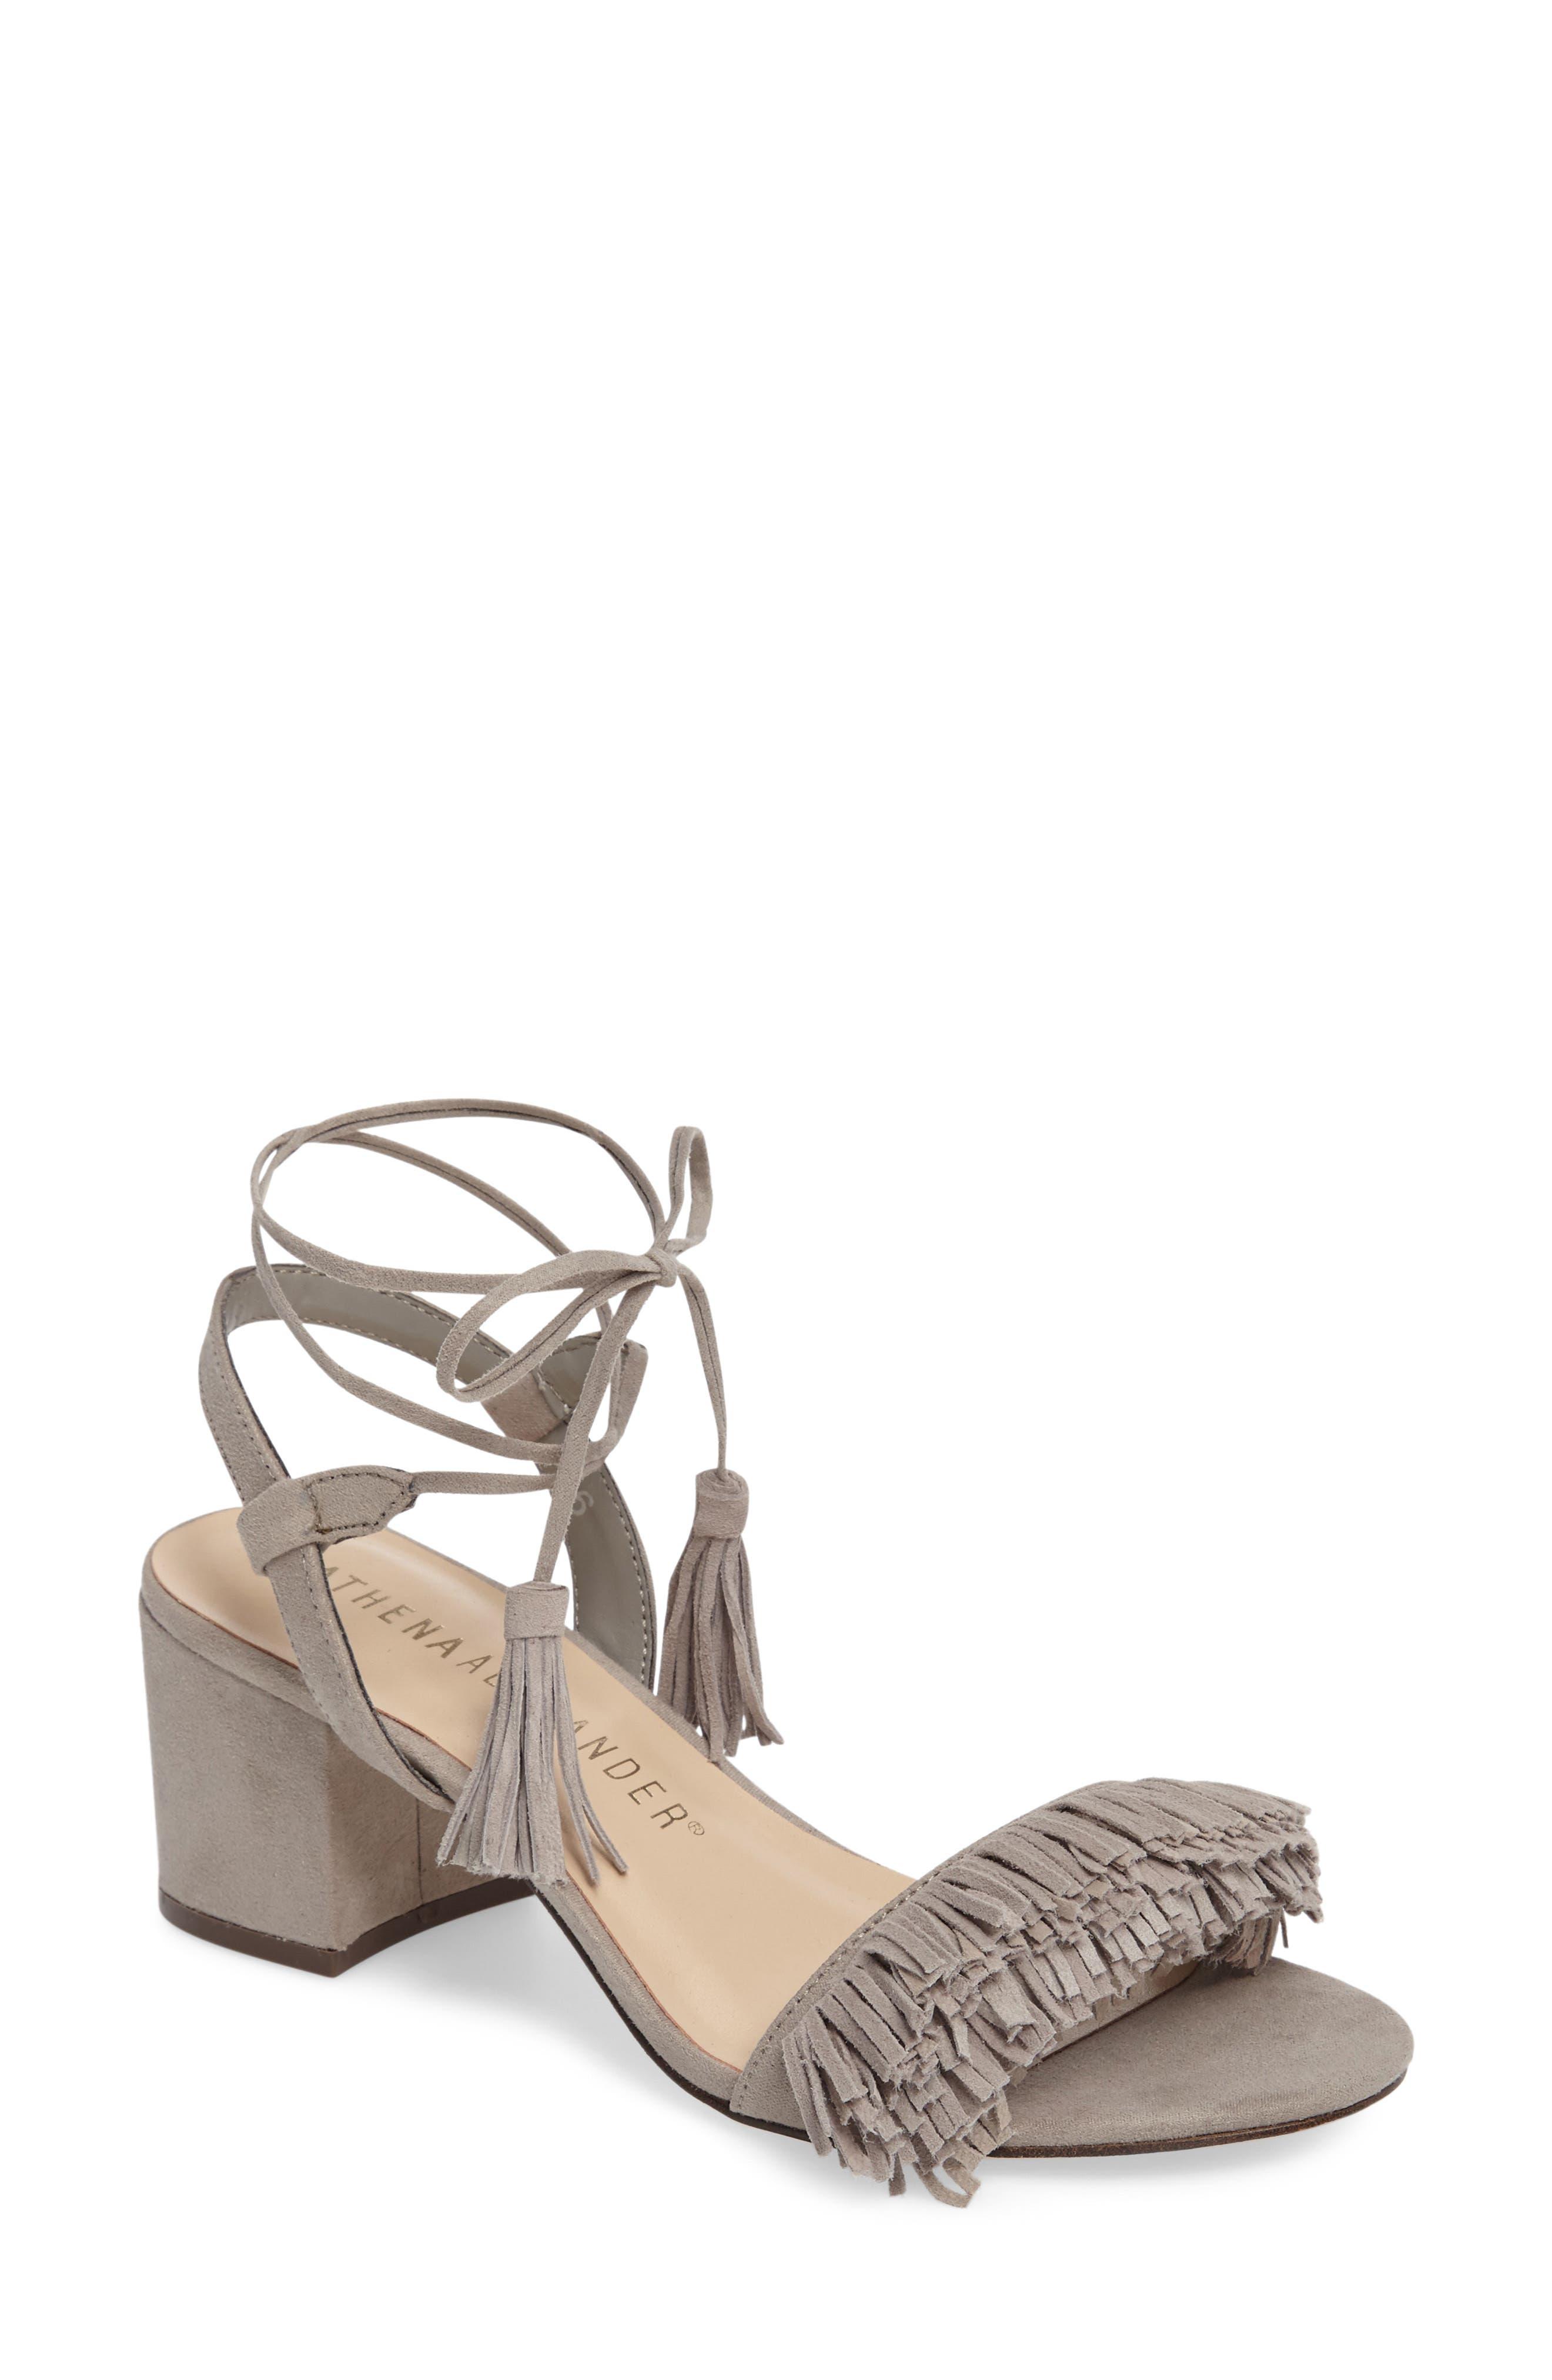 Alternate Image 1 Selected - Athena Alexander Fringed Ankle Wrap Sandal (Women)